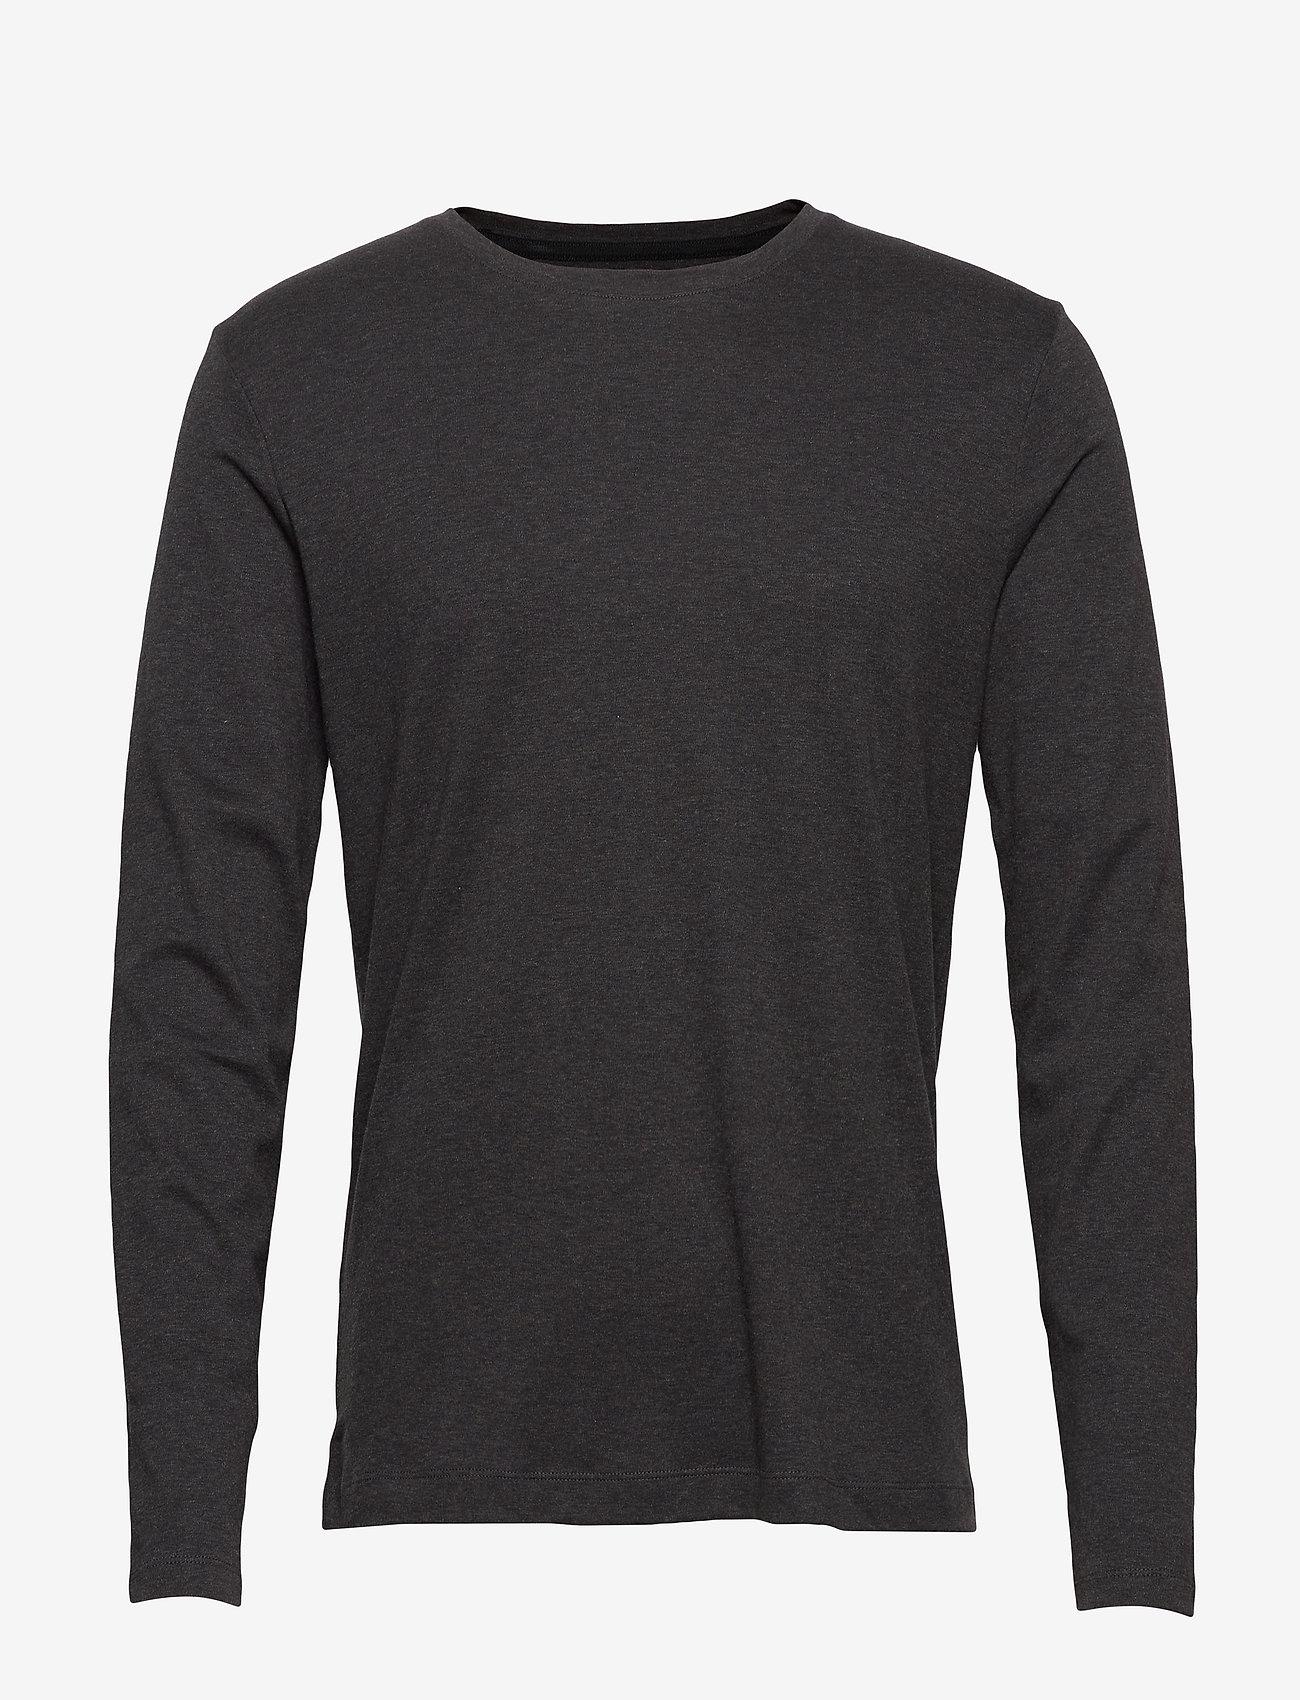 Banana Republic - Luxury-Touch Crew-Neck T-Shirt - basic t-shirts - dark charcoal - 0